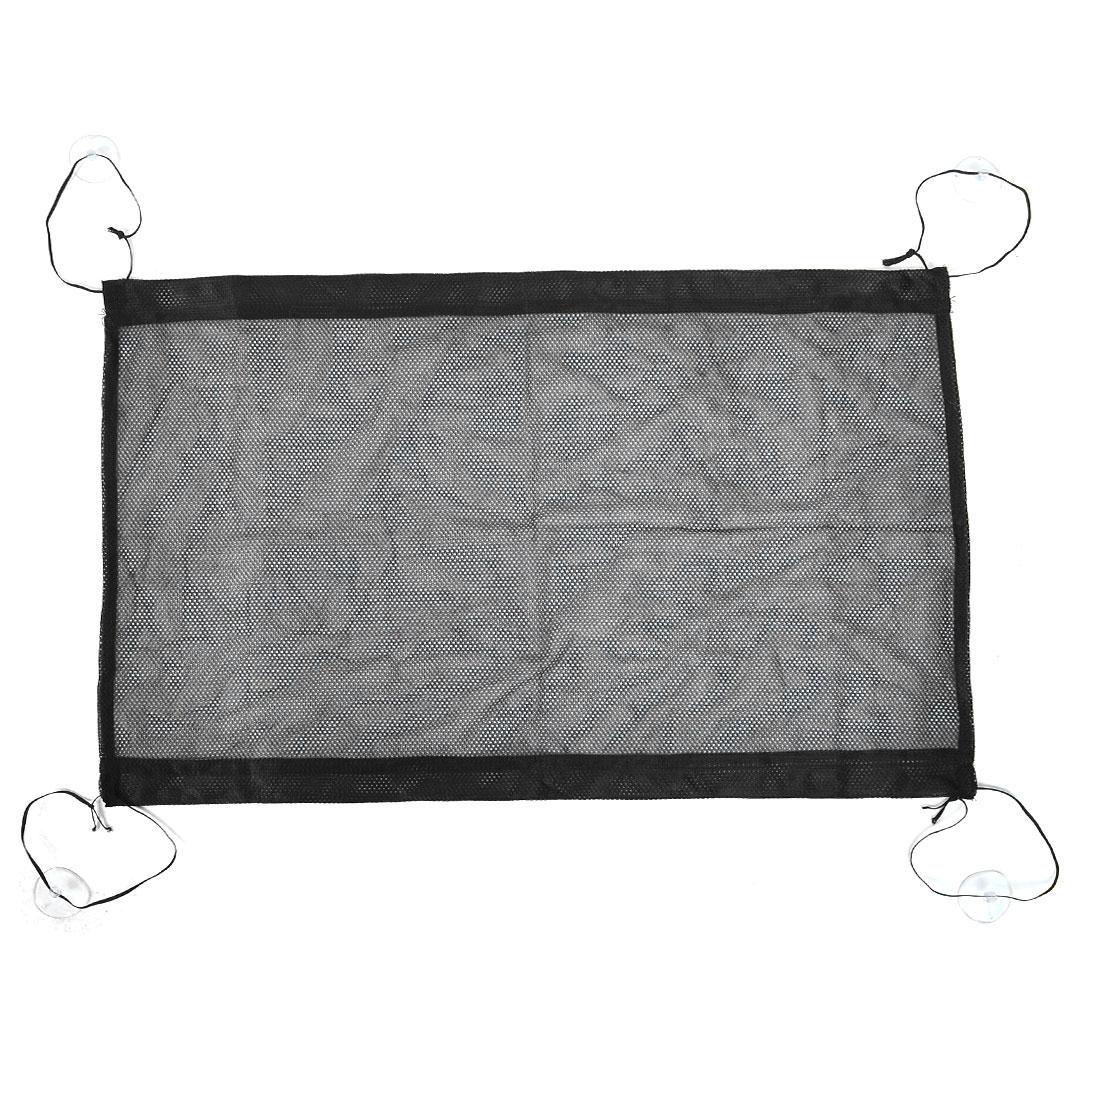 45cm x 70cm Black Mesh Curtain Car Window Sun Shade 2pcs w 8 Suction Cup